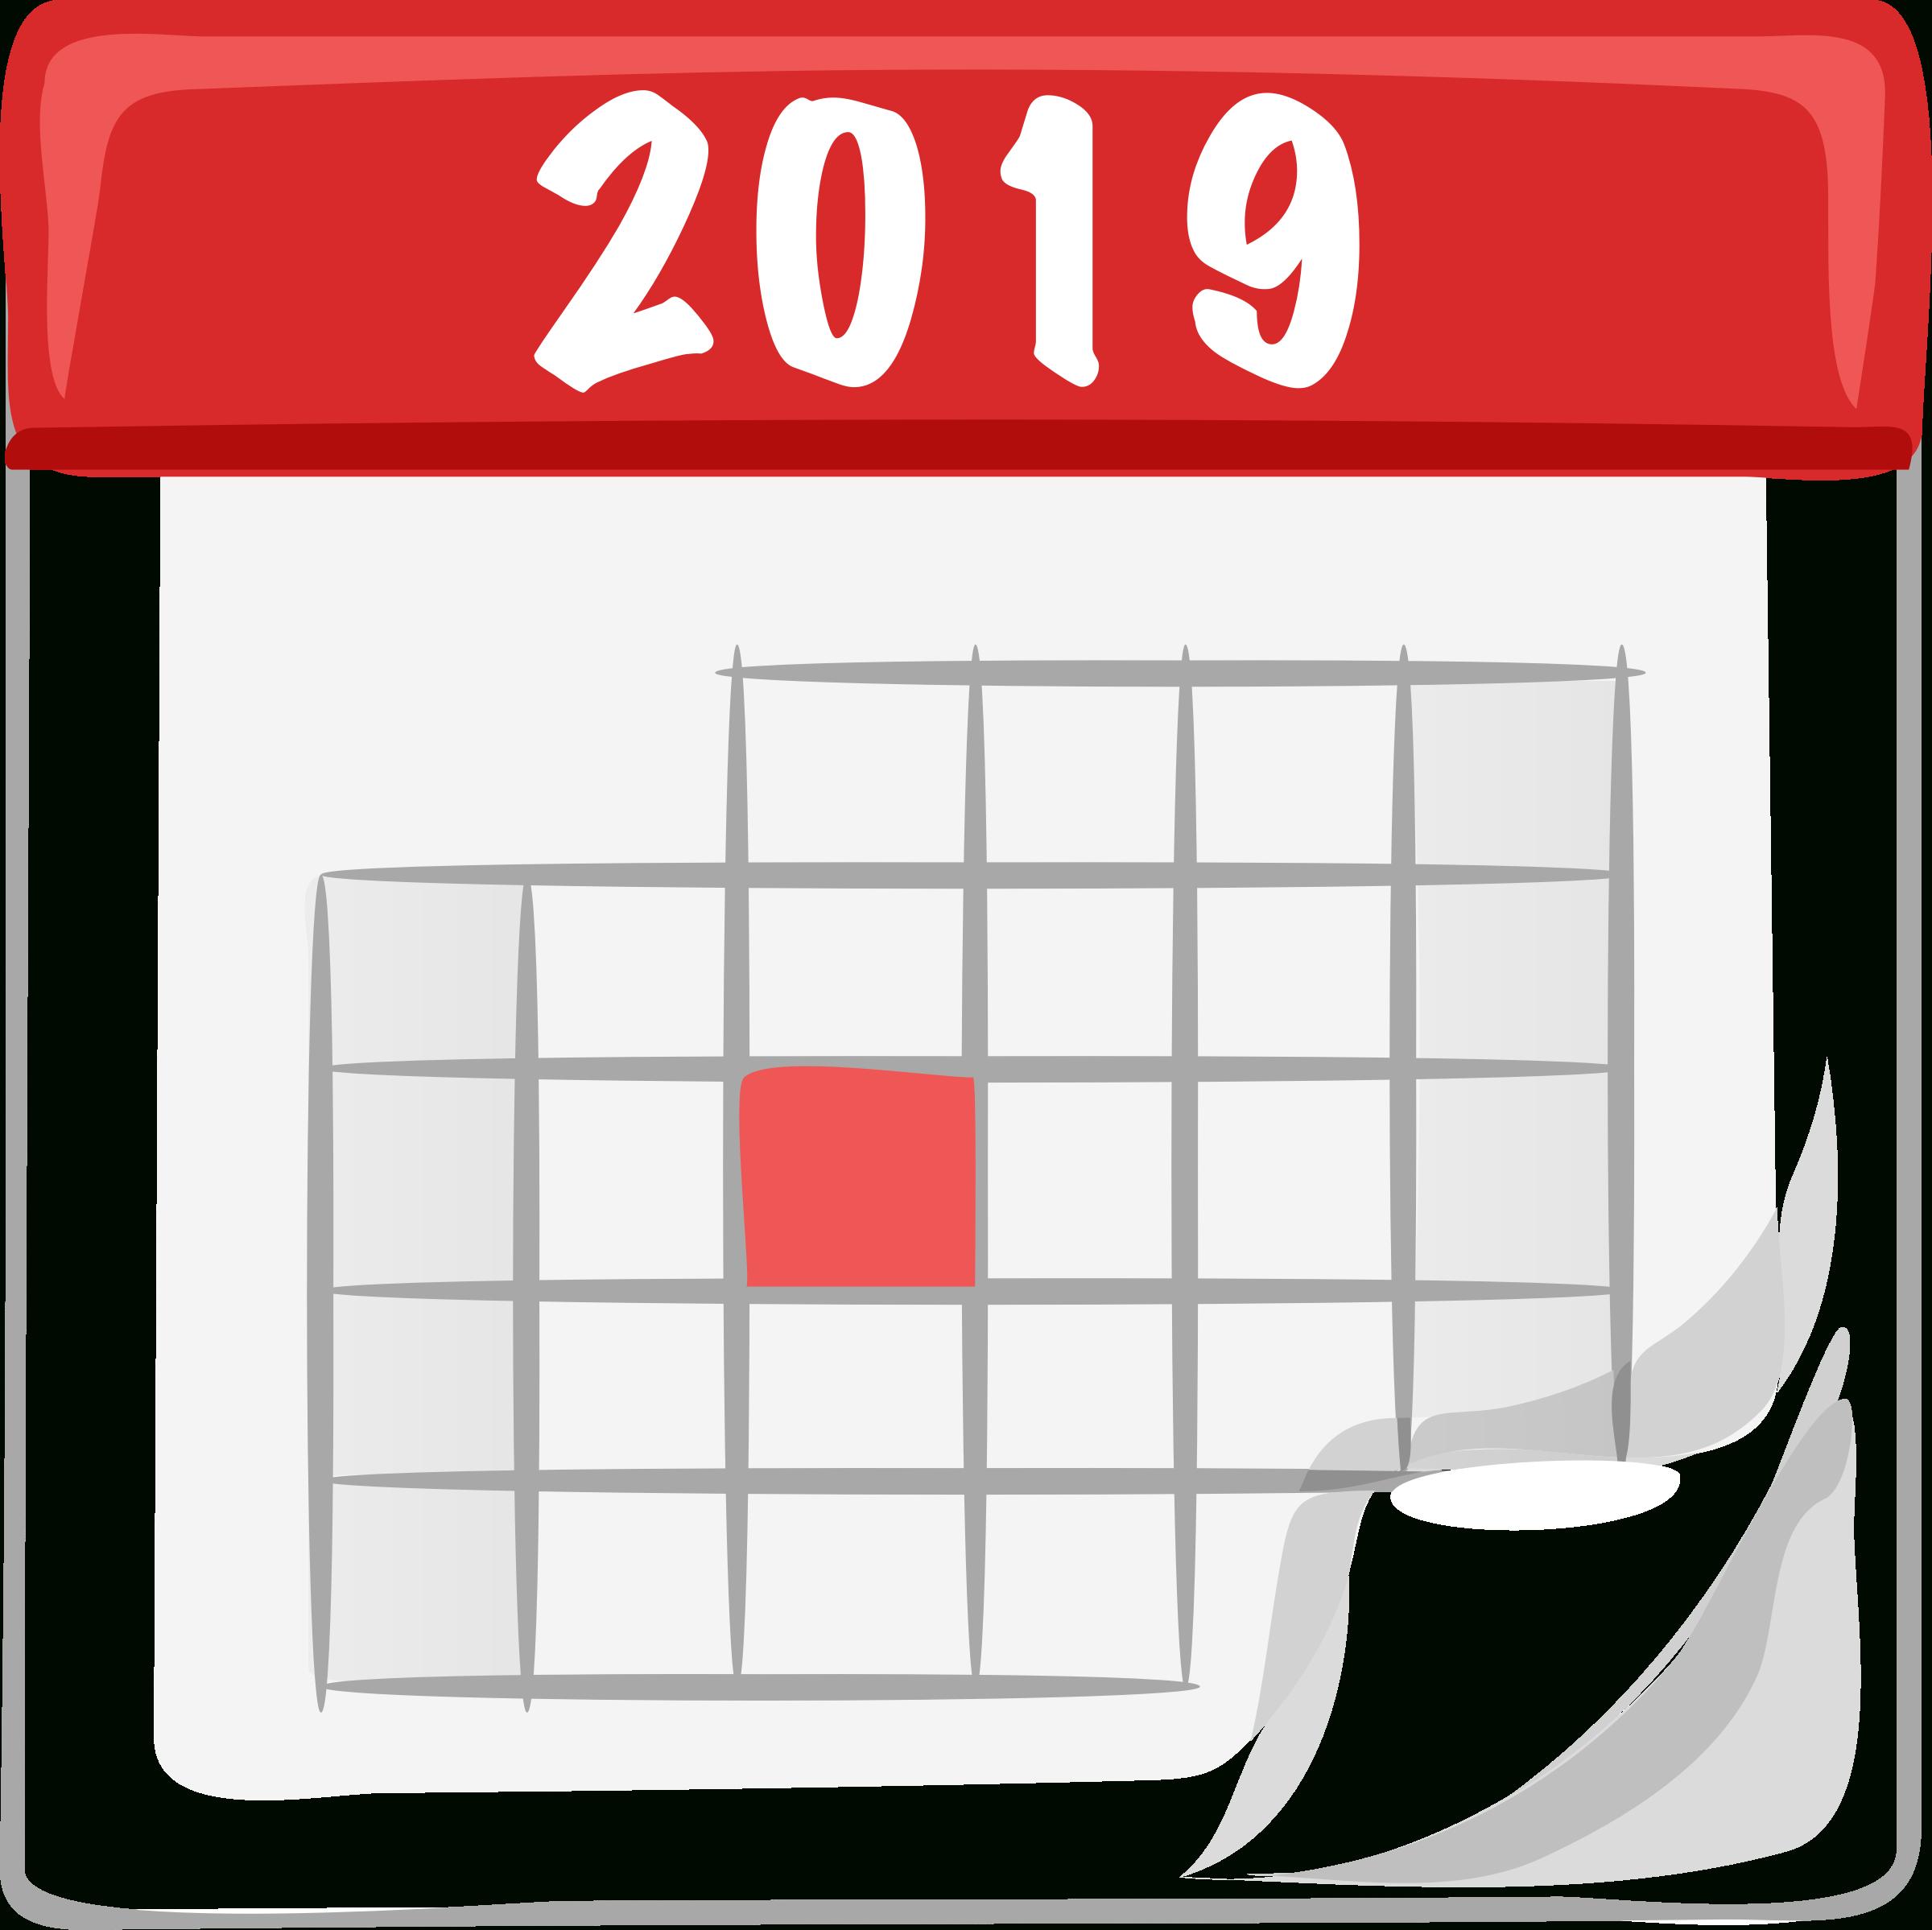 Calendar Of Marcellus/utica Events Now Thru Sept 2019     Marcellus Calendar 2019 Clipart